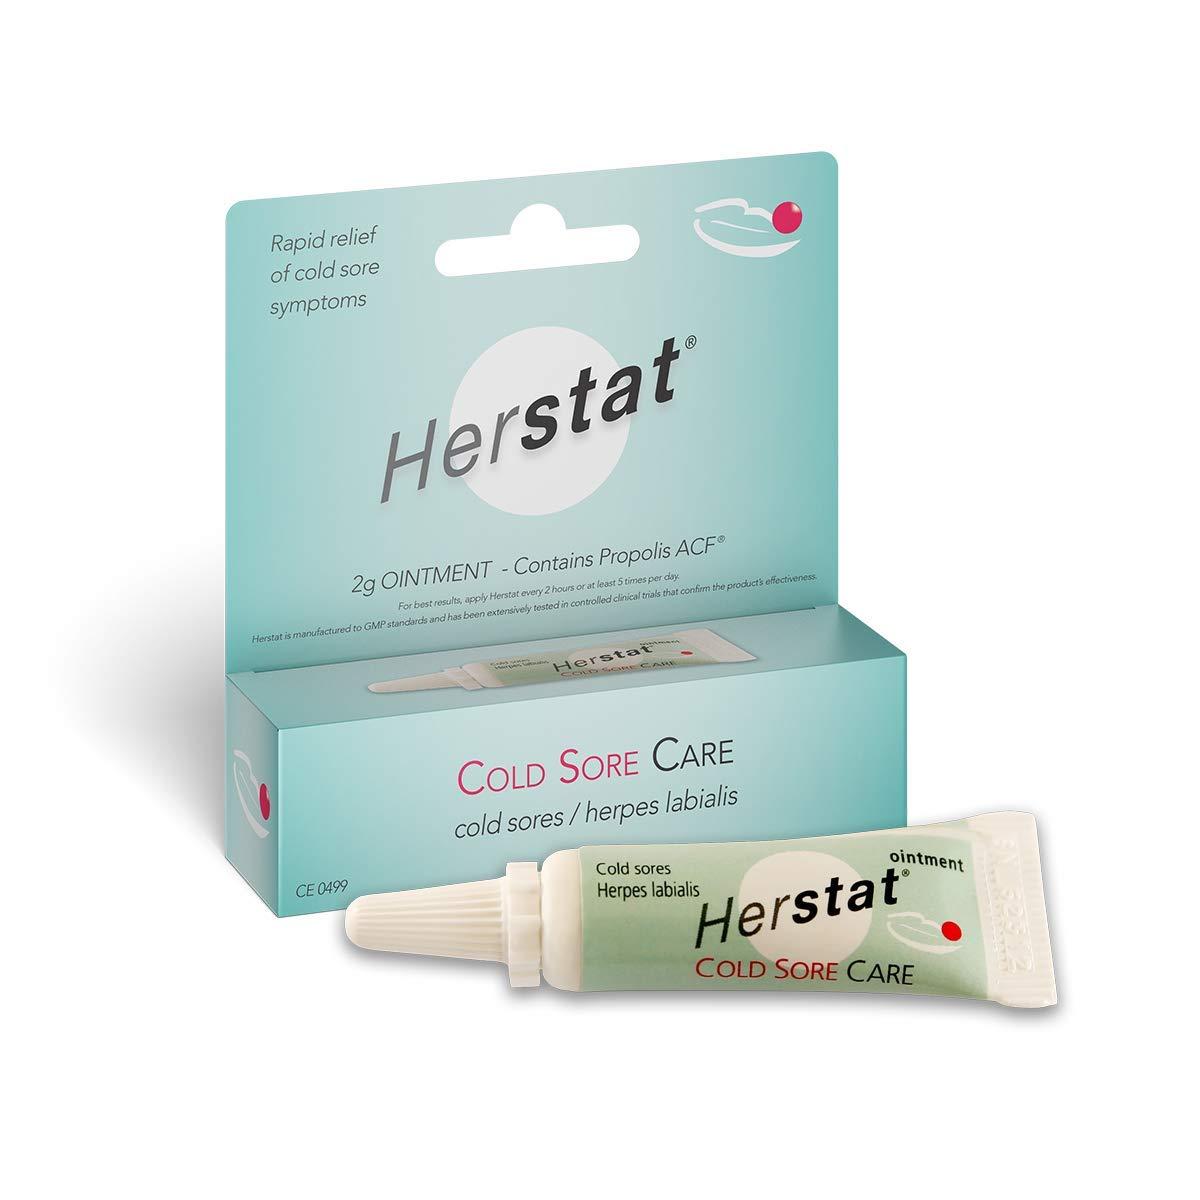 Herstat Cold Sore Cream – Effective Propolis Cold Sore Treatment